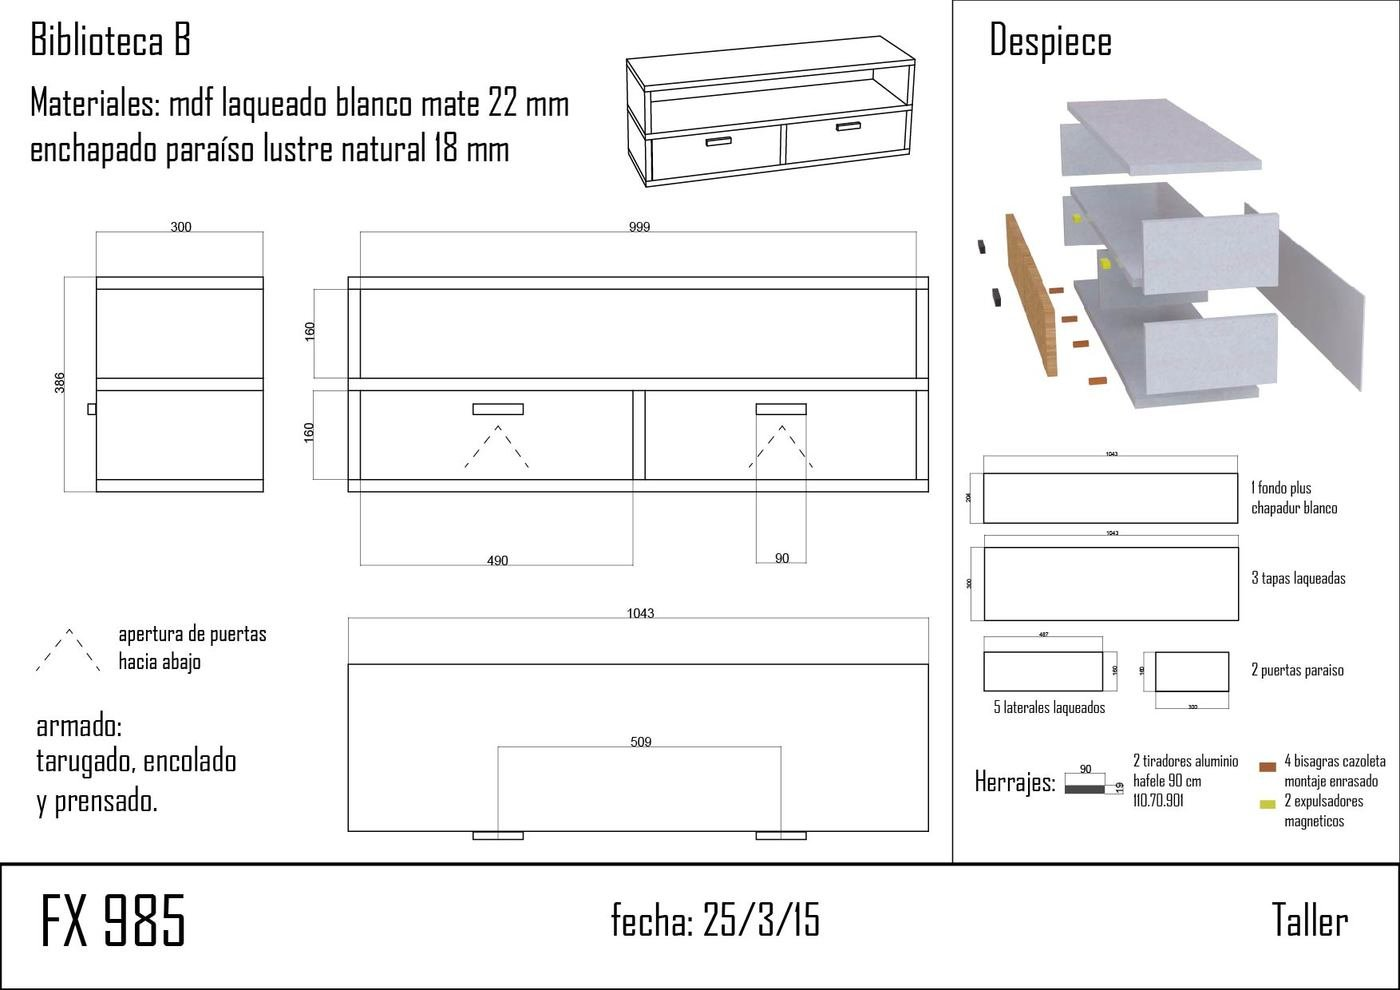 Muebles Hormiga Emergente By Evelyn Moran At Coroflot Com # Muebles Ficha Tecnica